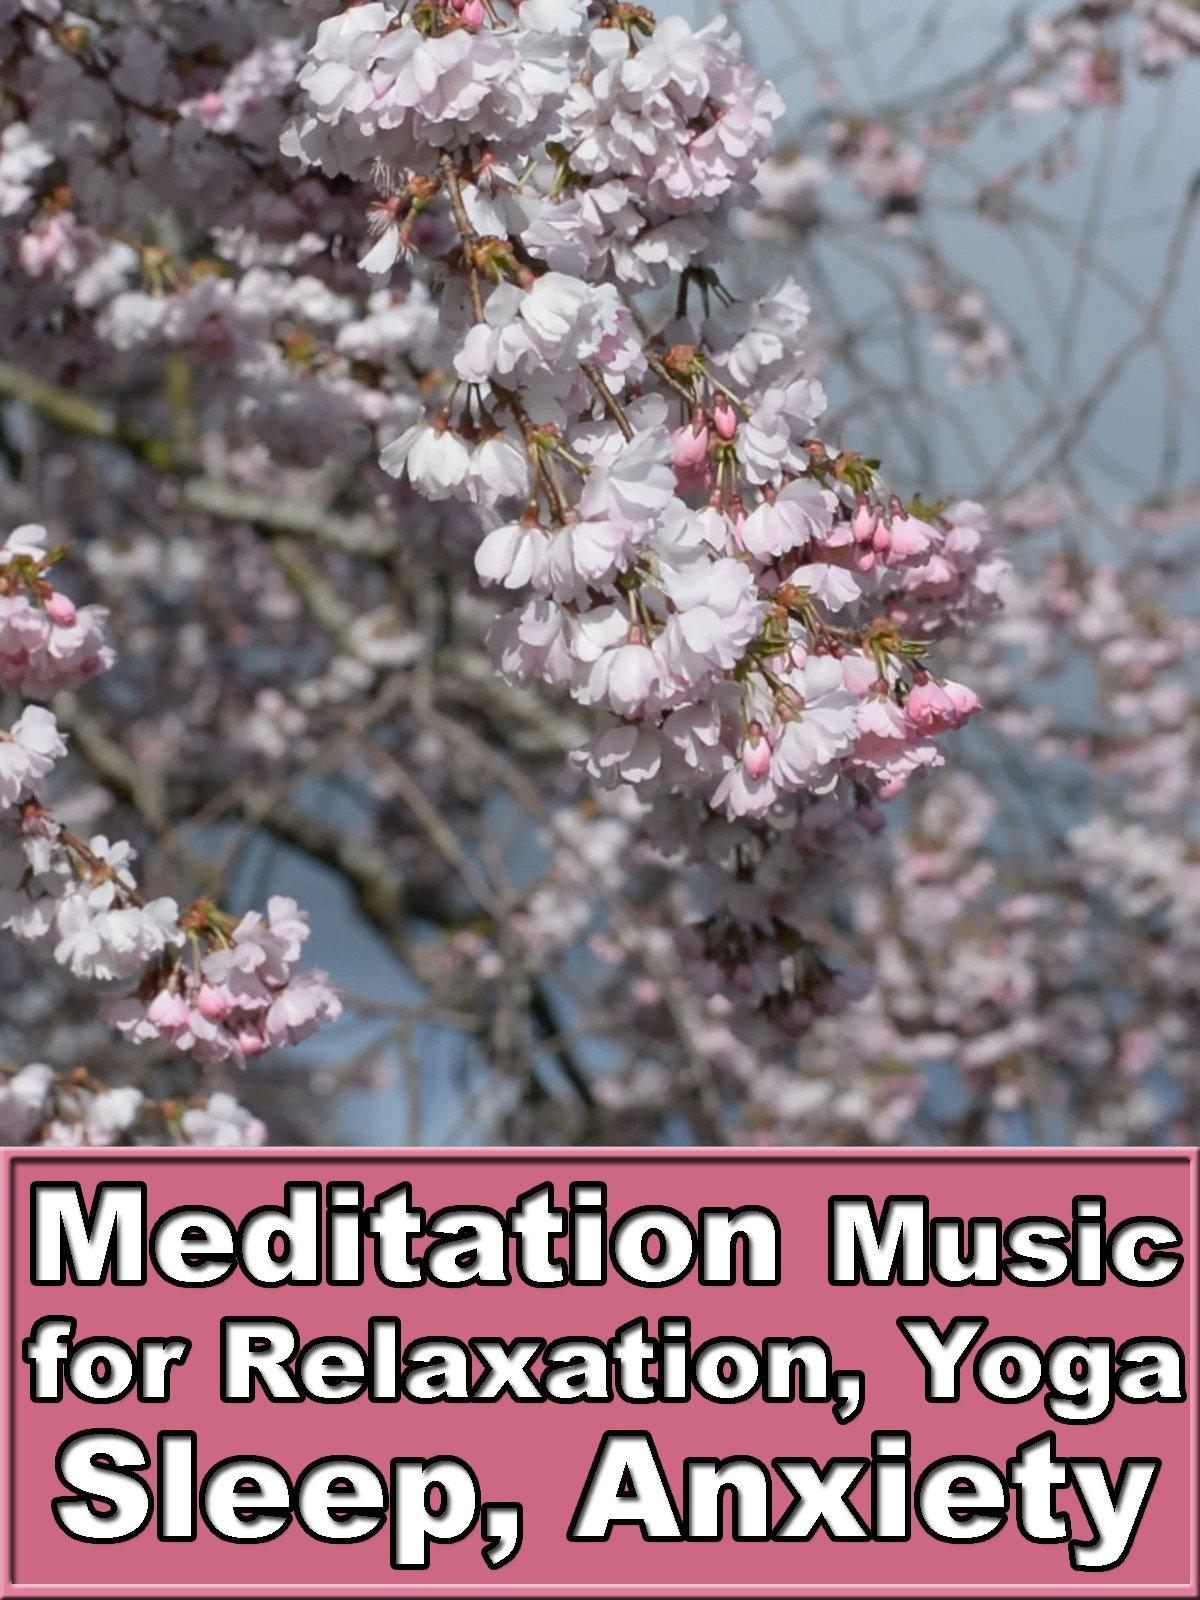 Meditation Music for Relaxation, Yoga, Sleep, Anxiety